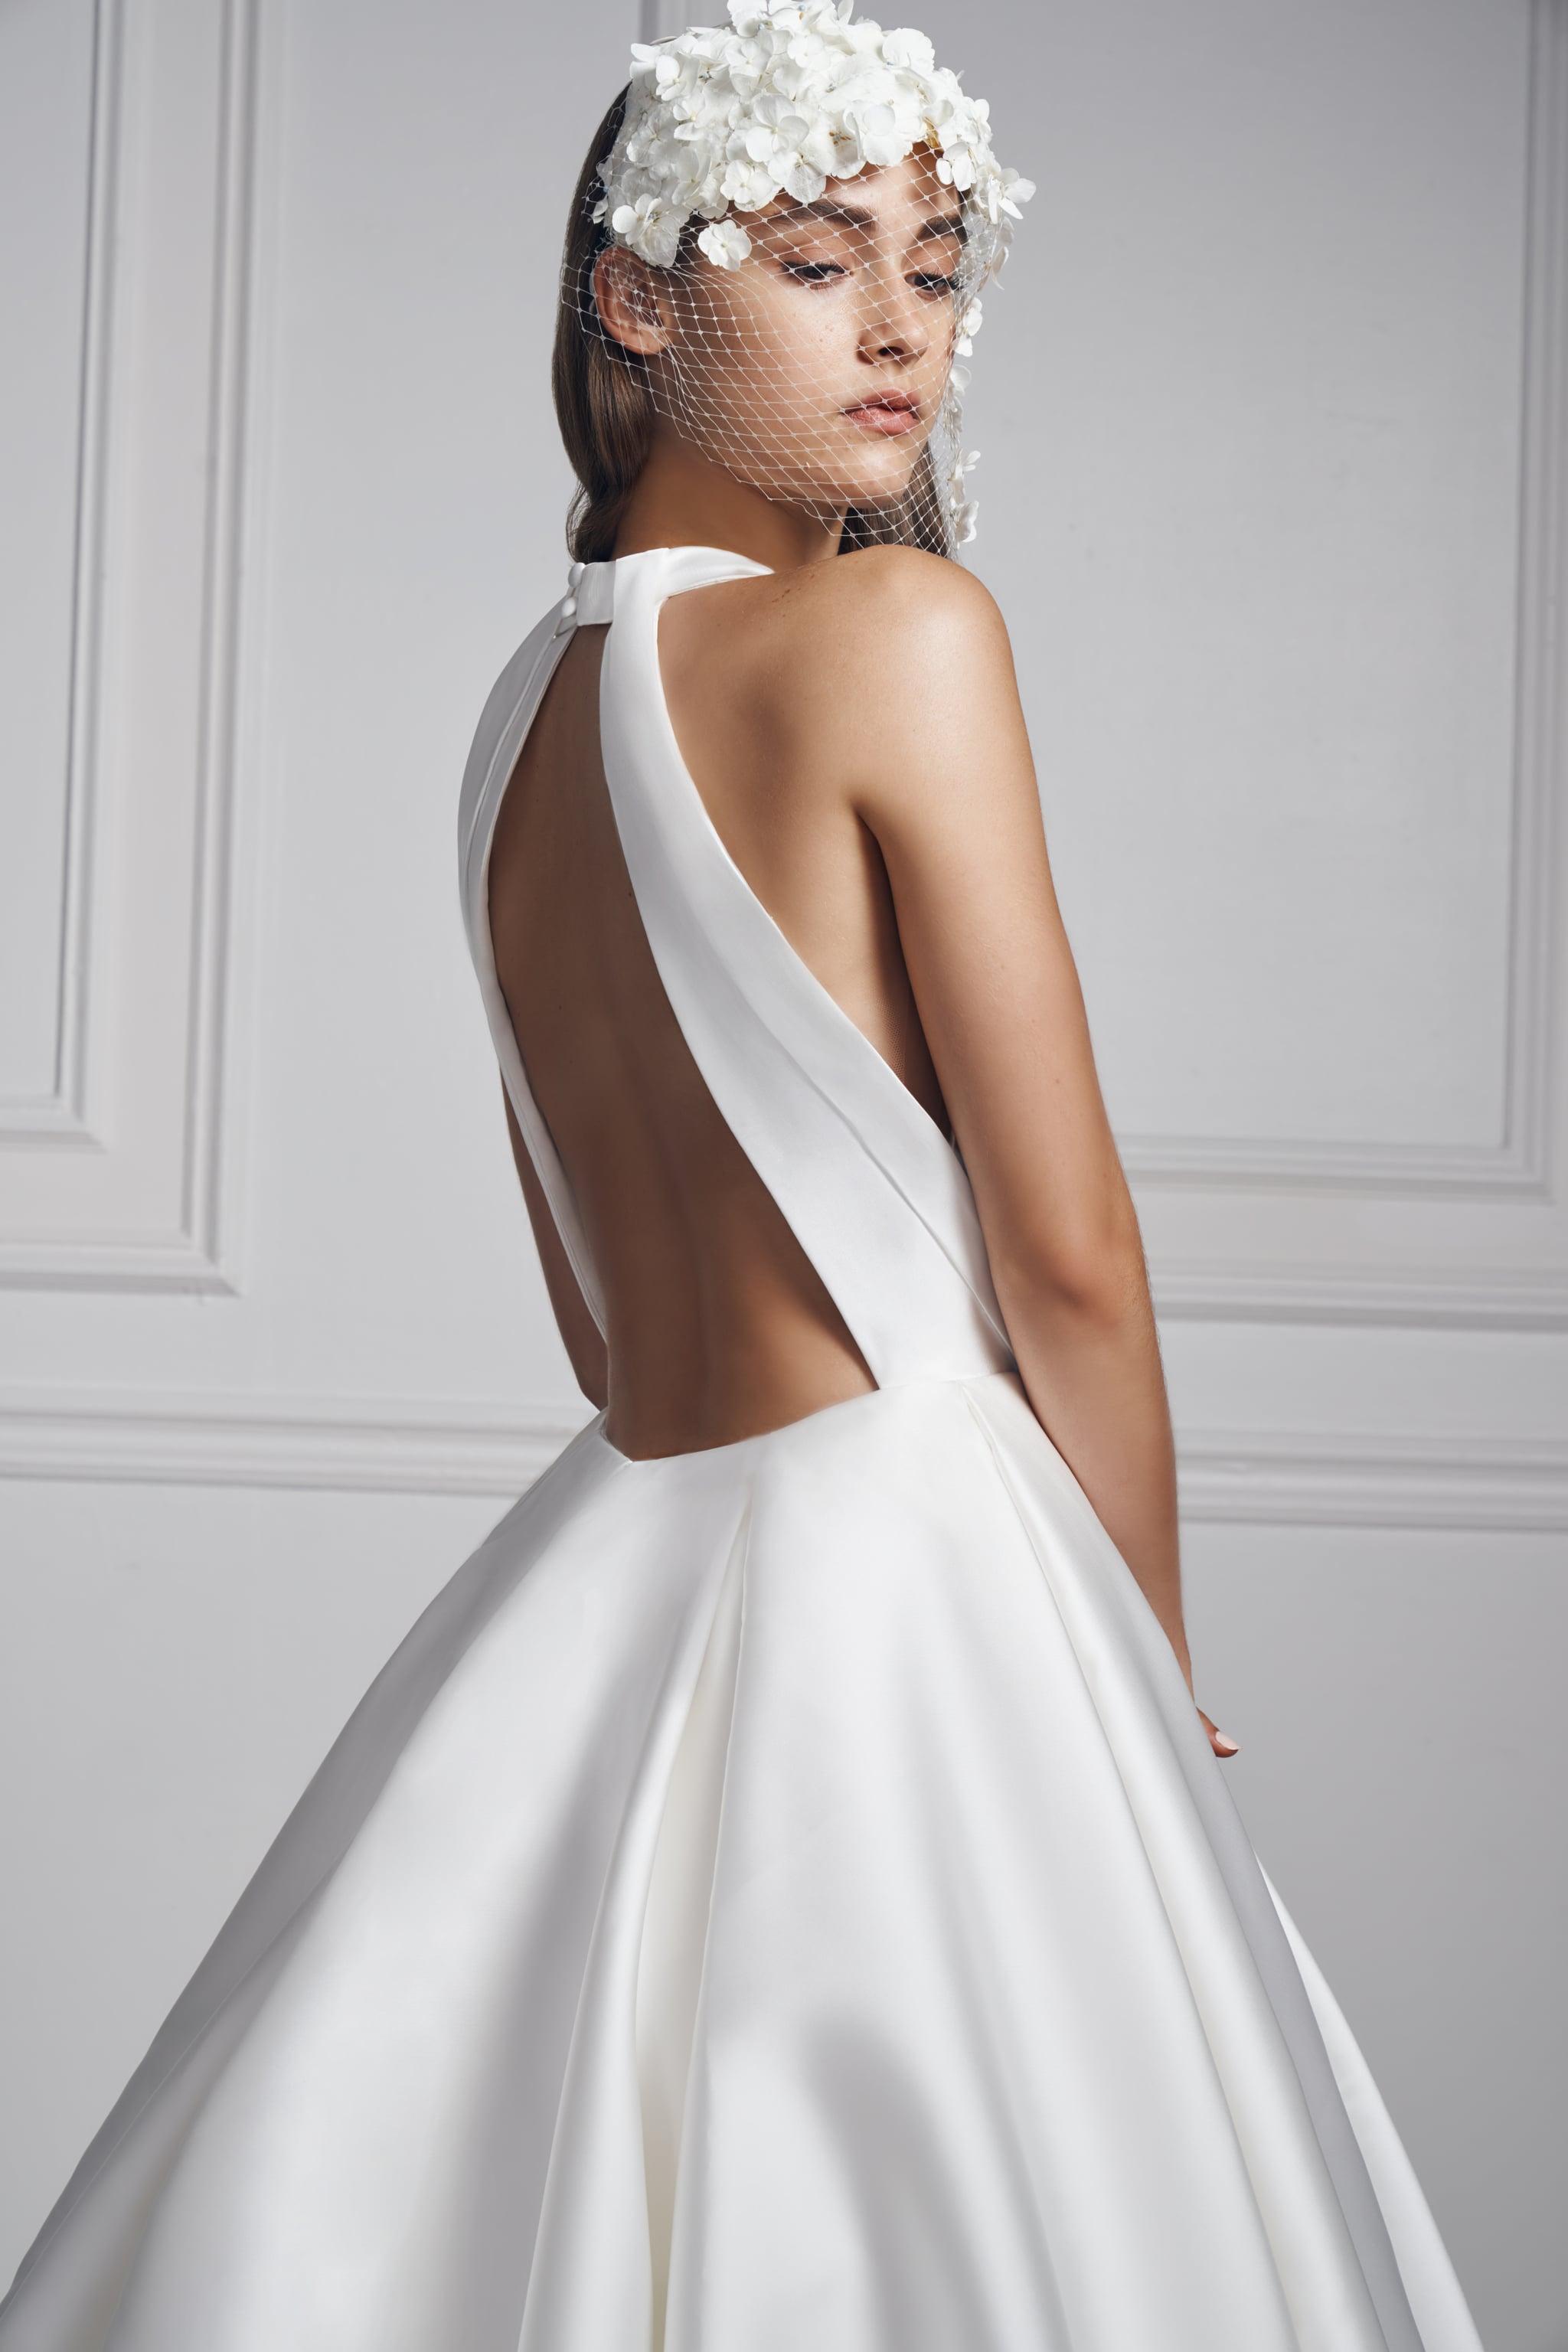 Wedding Dress Trends For The 2020 Bride Popsugar Fashion